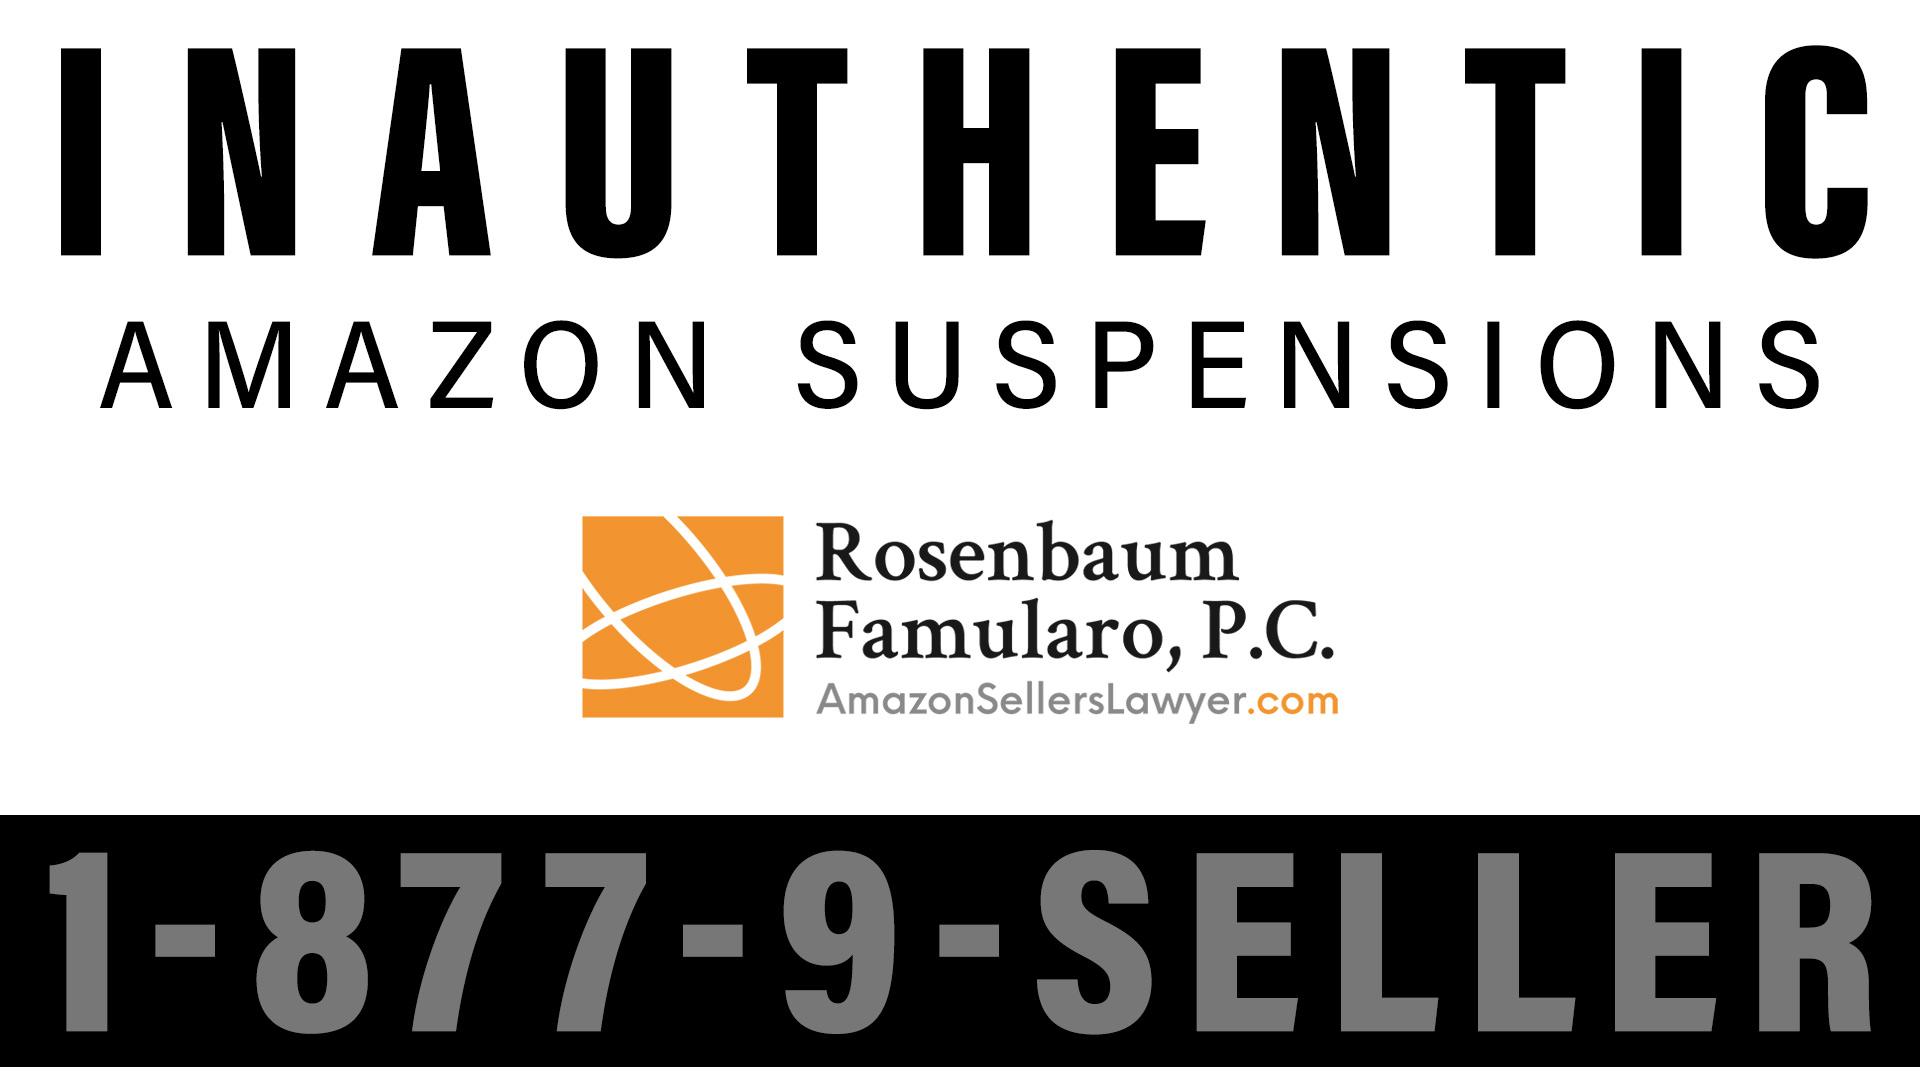 Inauthentic Suspension on Amazon